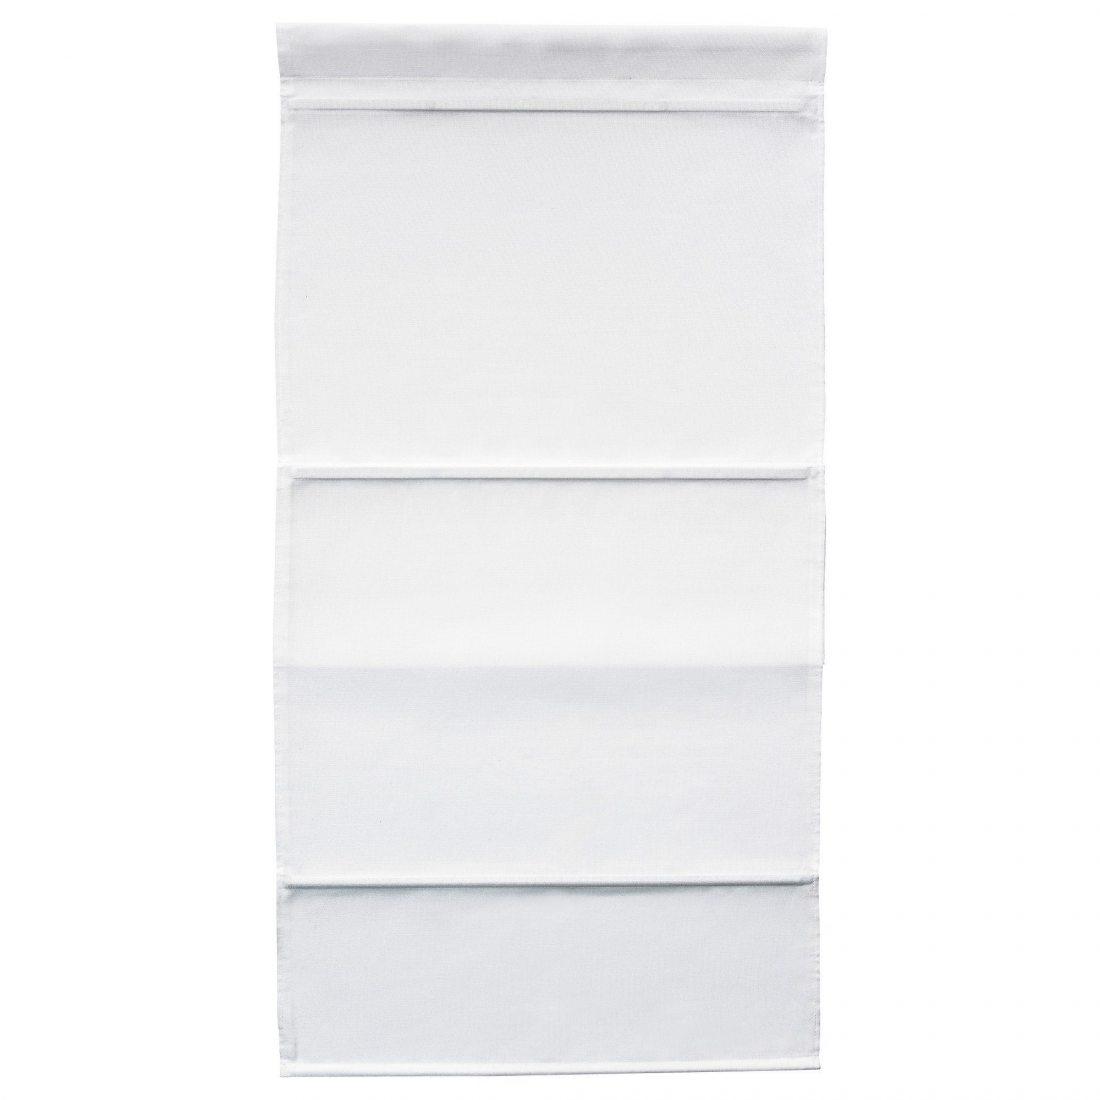 Store Bateau Blanc Ikea ikea ringblomma – store bateau blanc